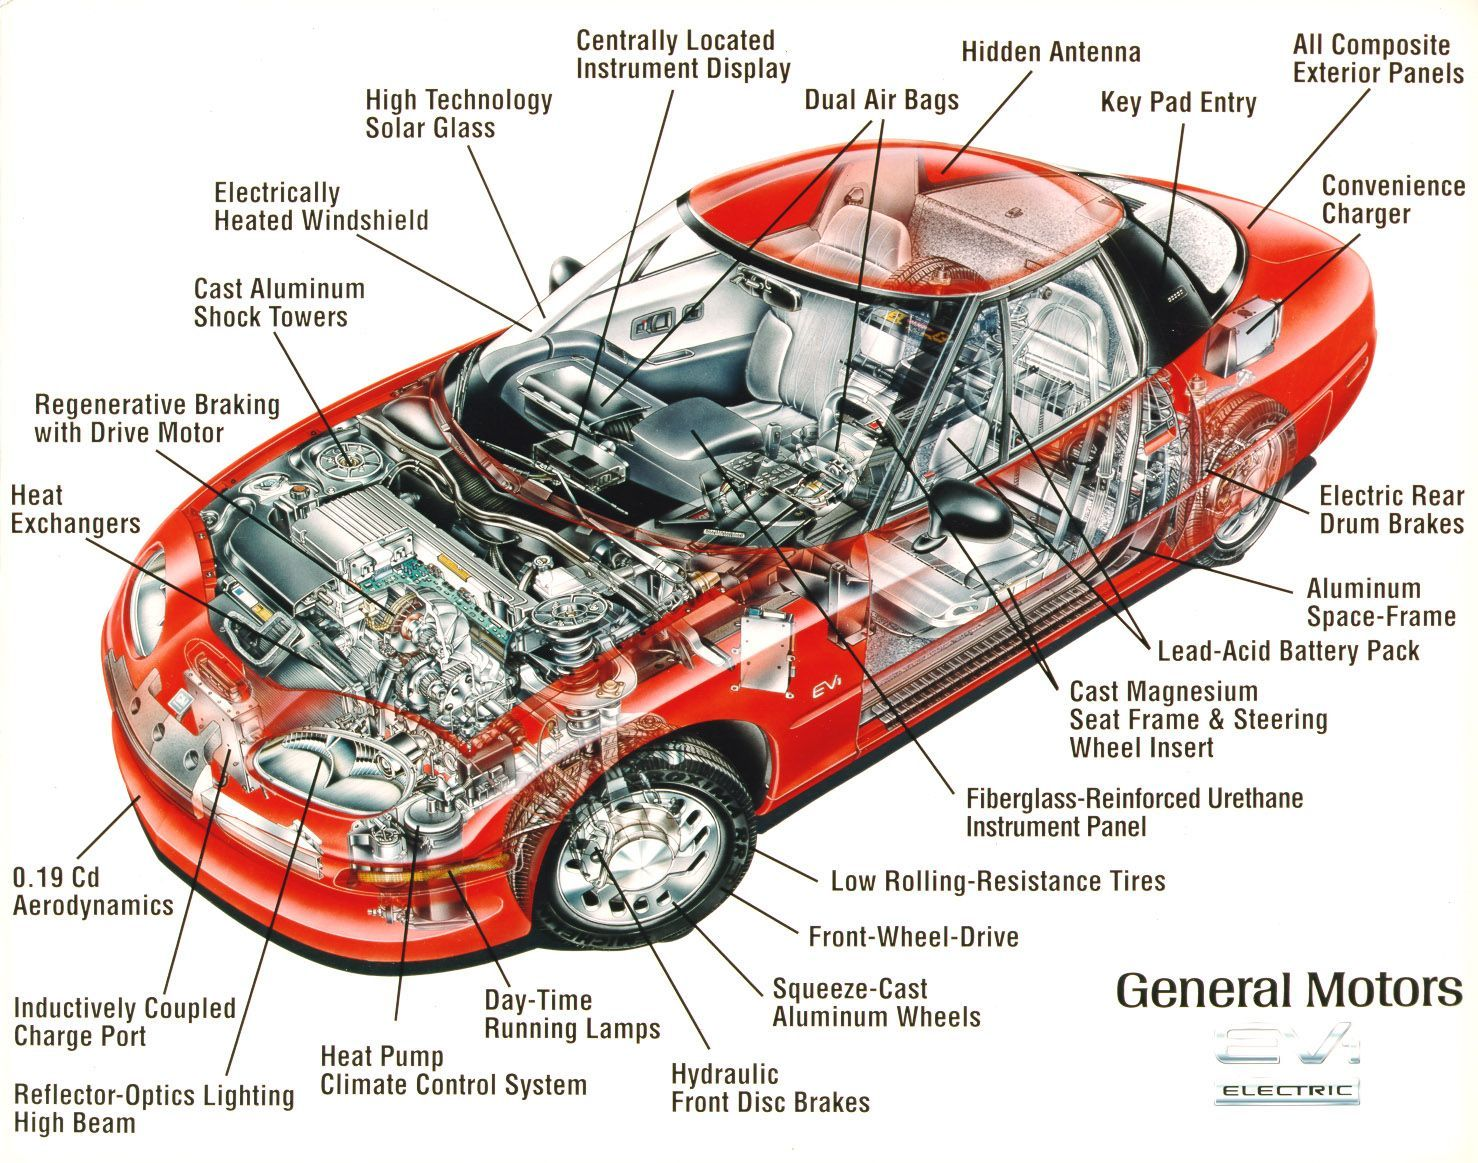 small resolution of basic car diagram wiring diagram source car interior dashboard diagram basic car engine parts diagram general